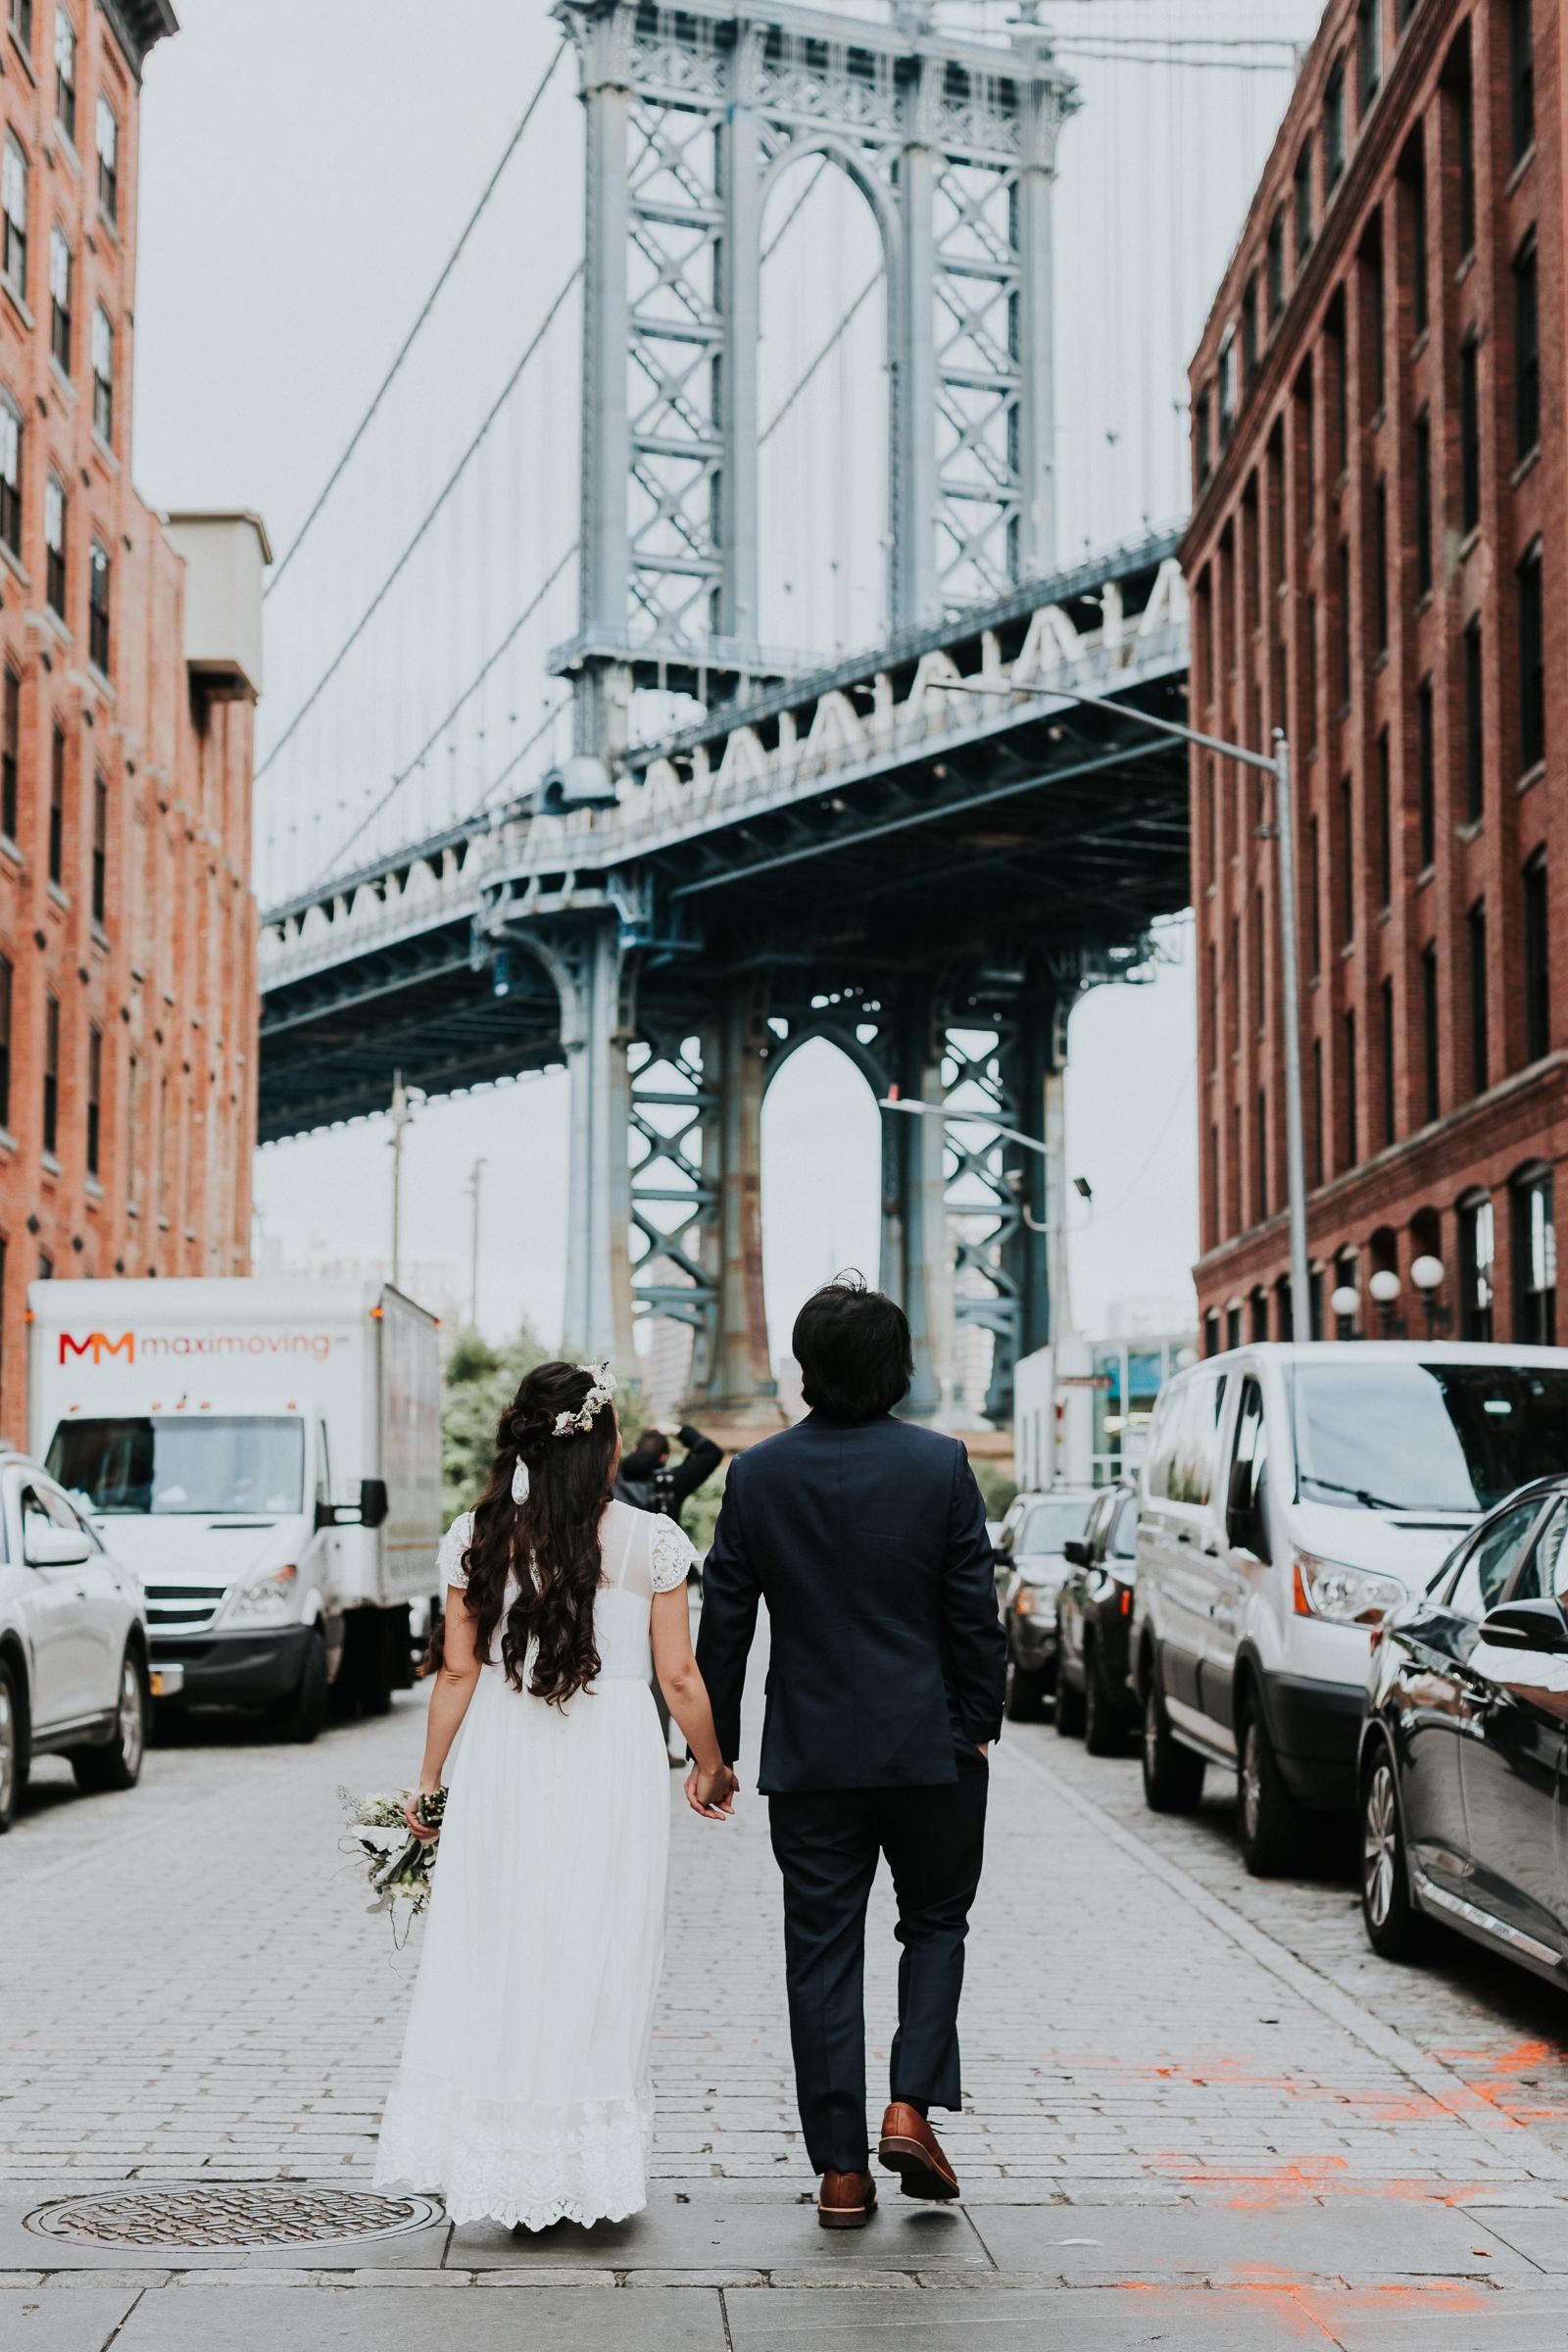 Central-Park-Brooklyn-Bridge-Dumbo-NYC-Documentary-Wedding-Photographer-3.jpg